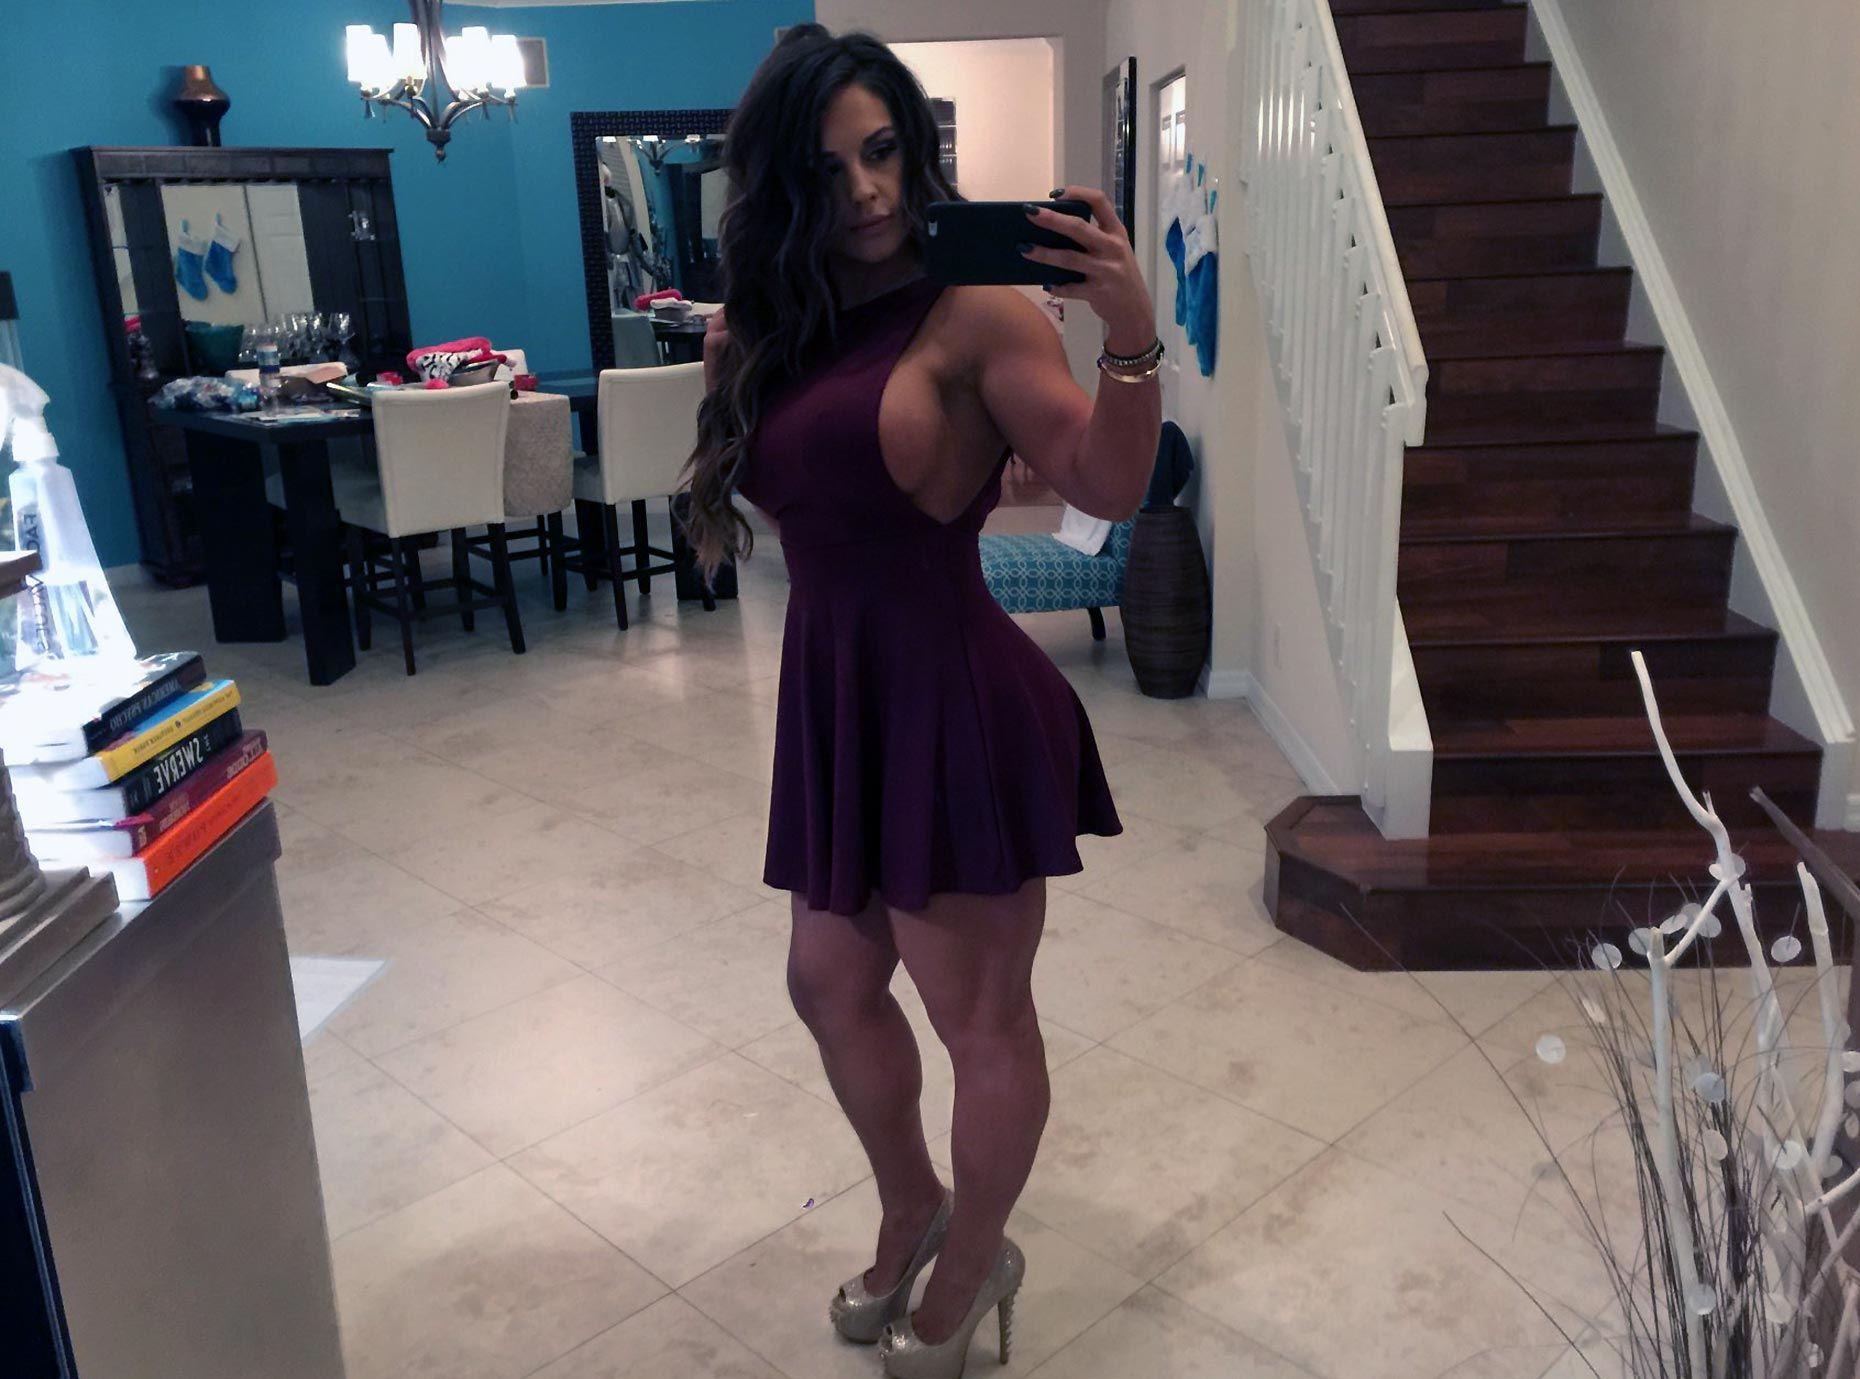 Celeste Bonin Nude Leaked The Fappening & Sexy 0278